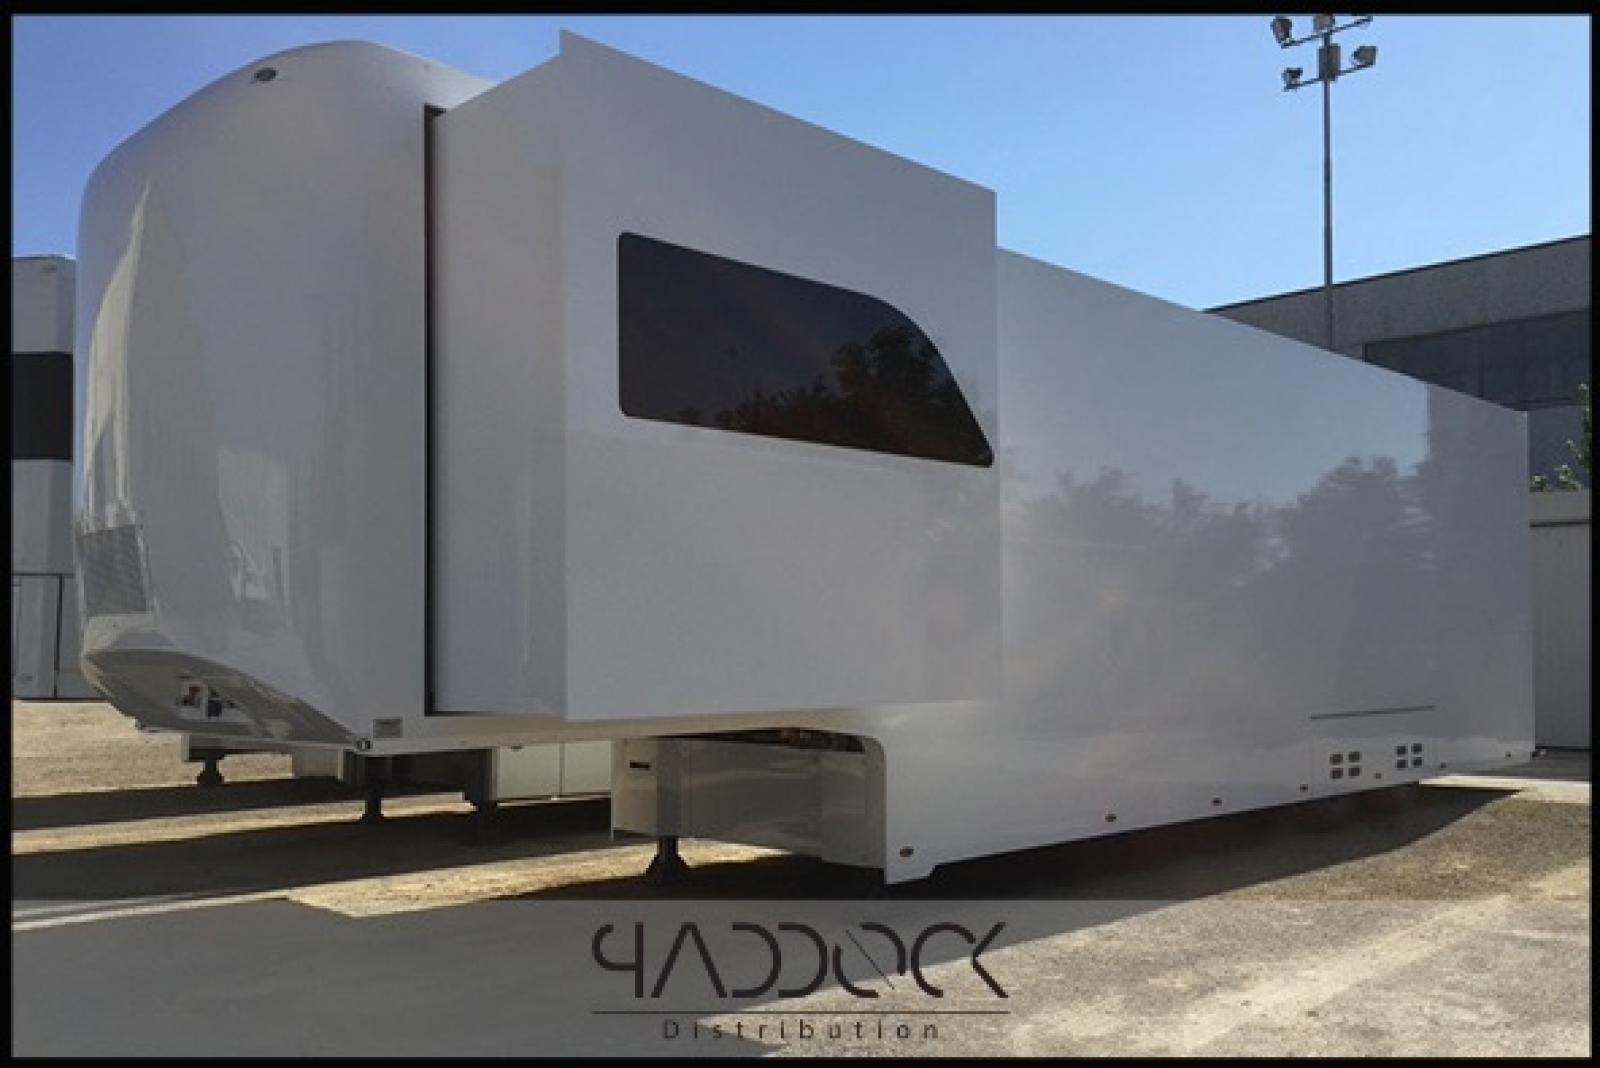 ASTA CAR Z3 SLIDE TRAILER BY PADDOCK DISTRIBUTION - 1